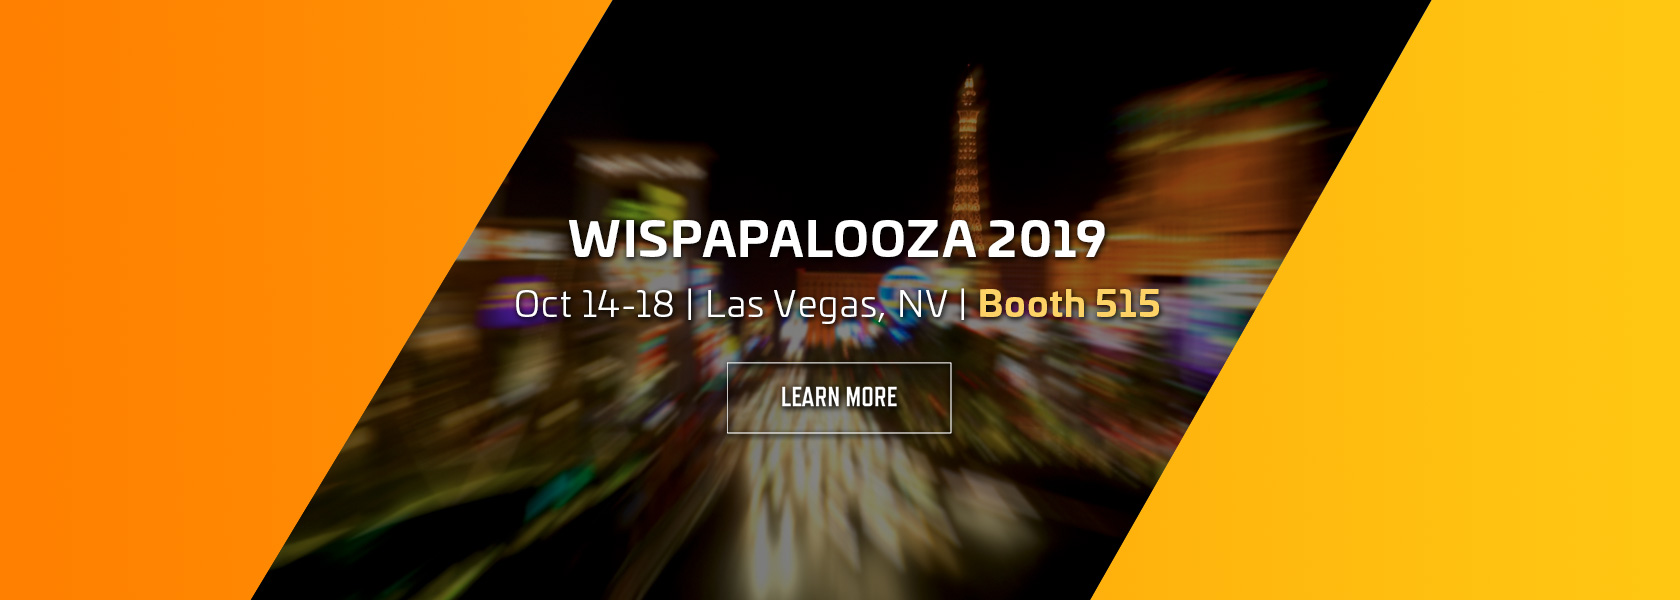 Booth 515 WISPAPALOOZA 2019